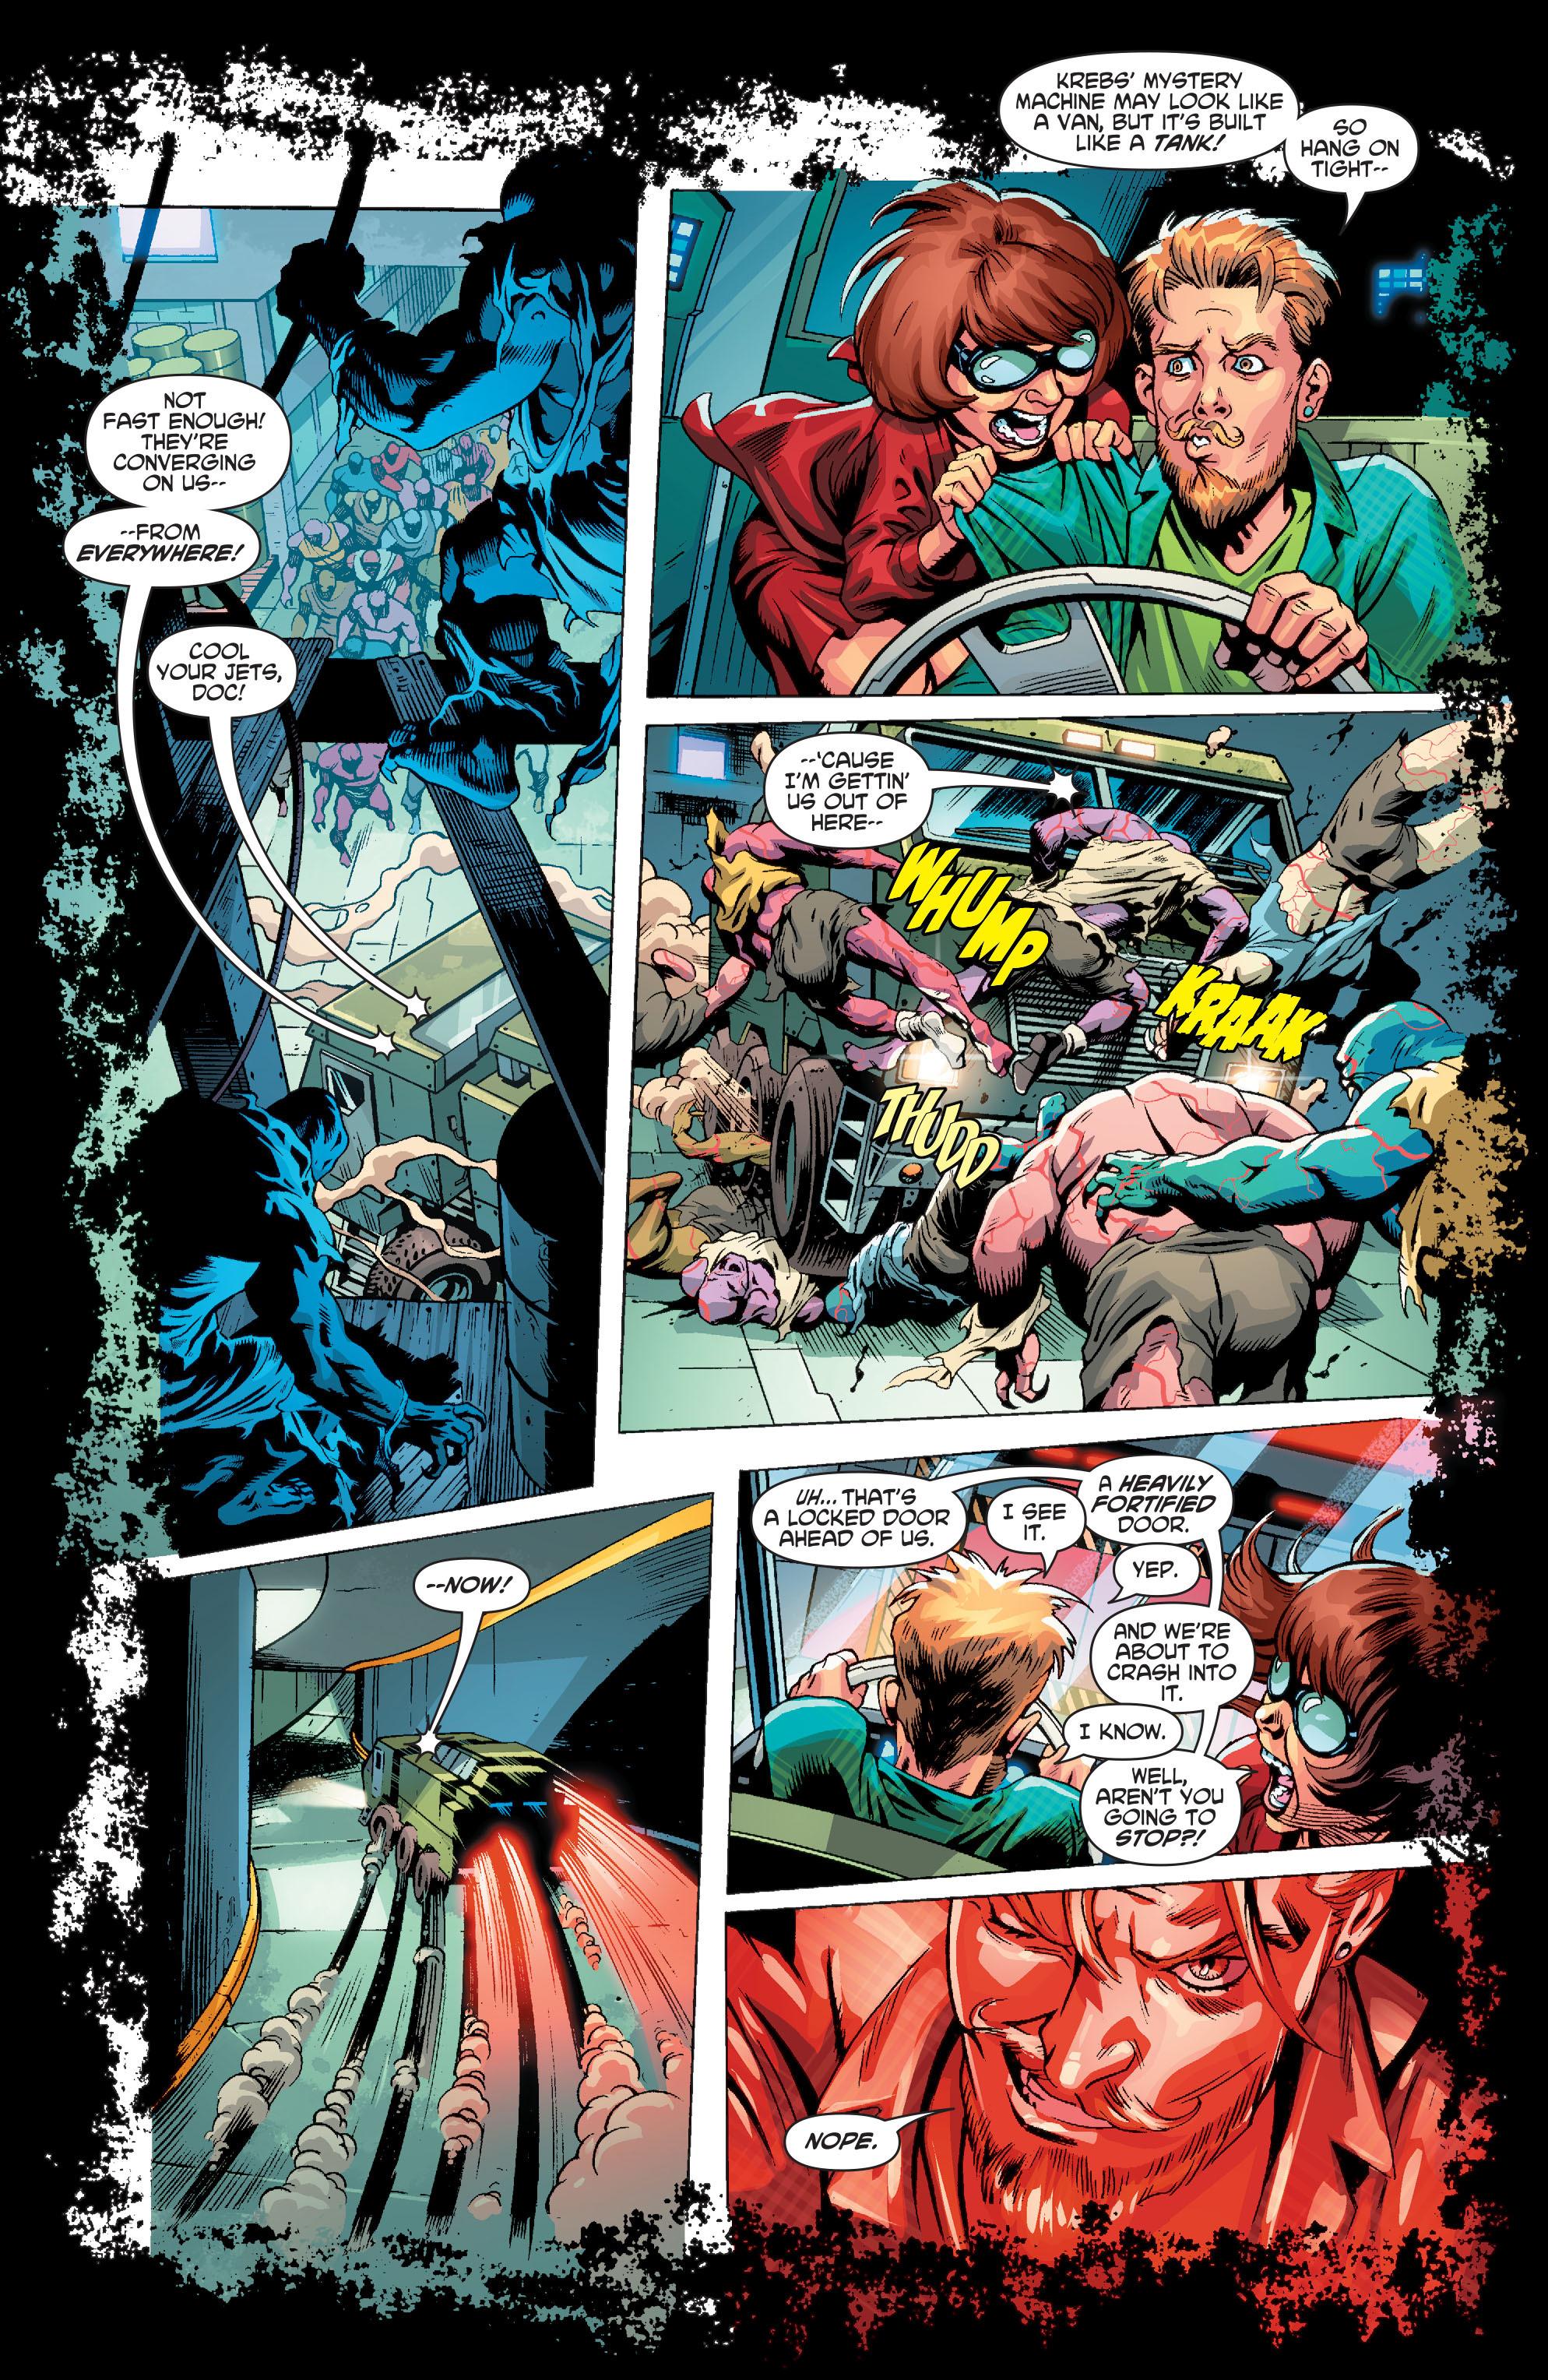 Read online Scooby Apocalypse comic -  Issue #3 - 18